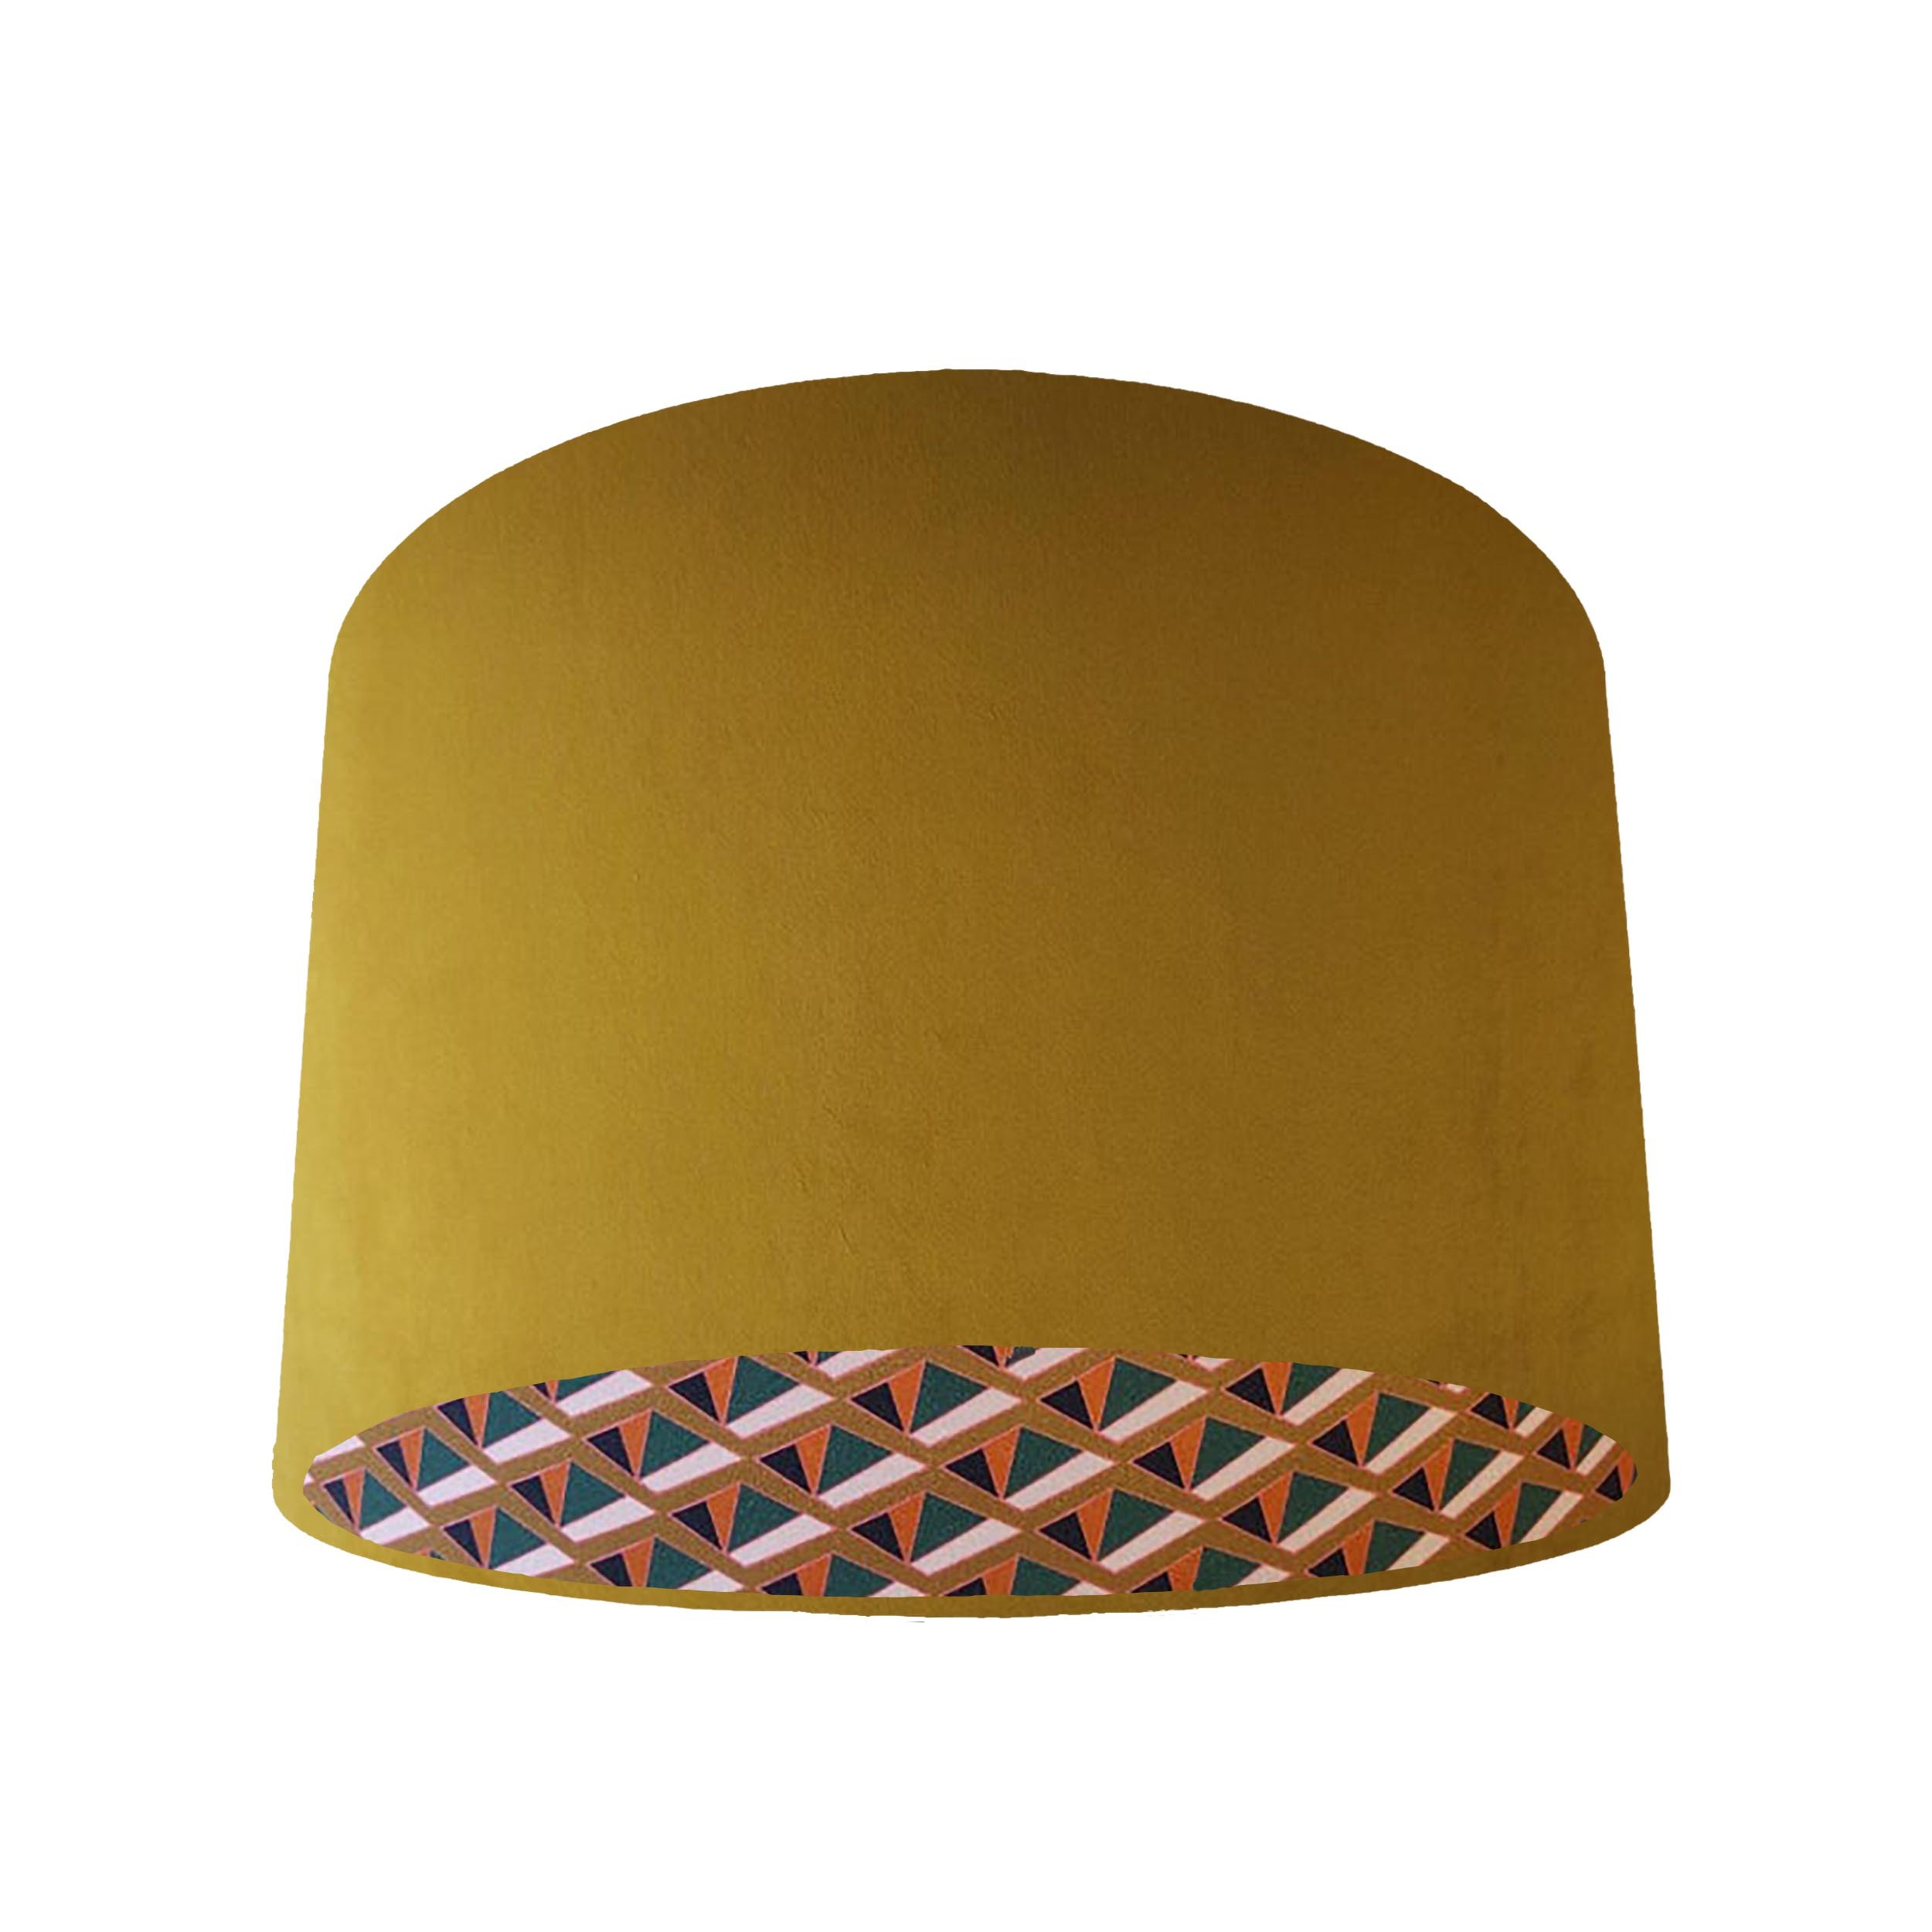 Mustard Velvet and Geometric Lined Lampshade